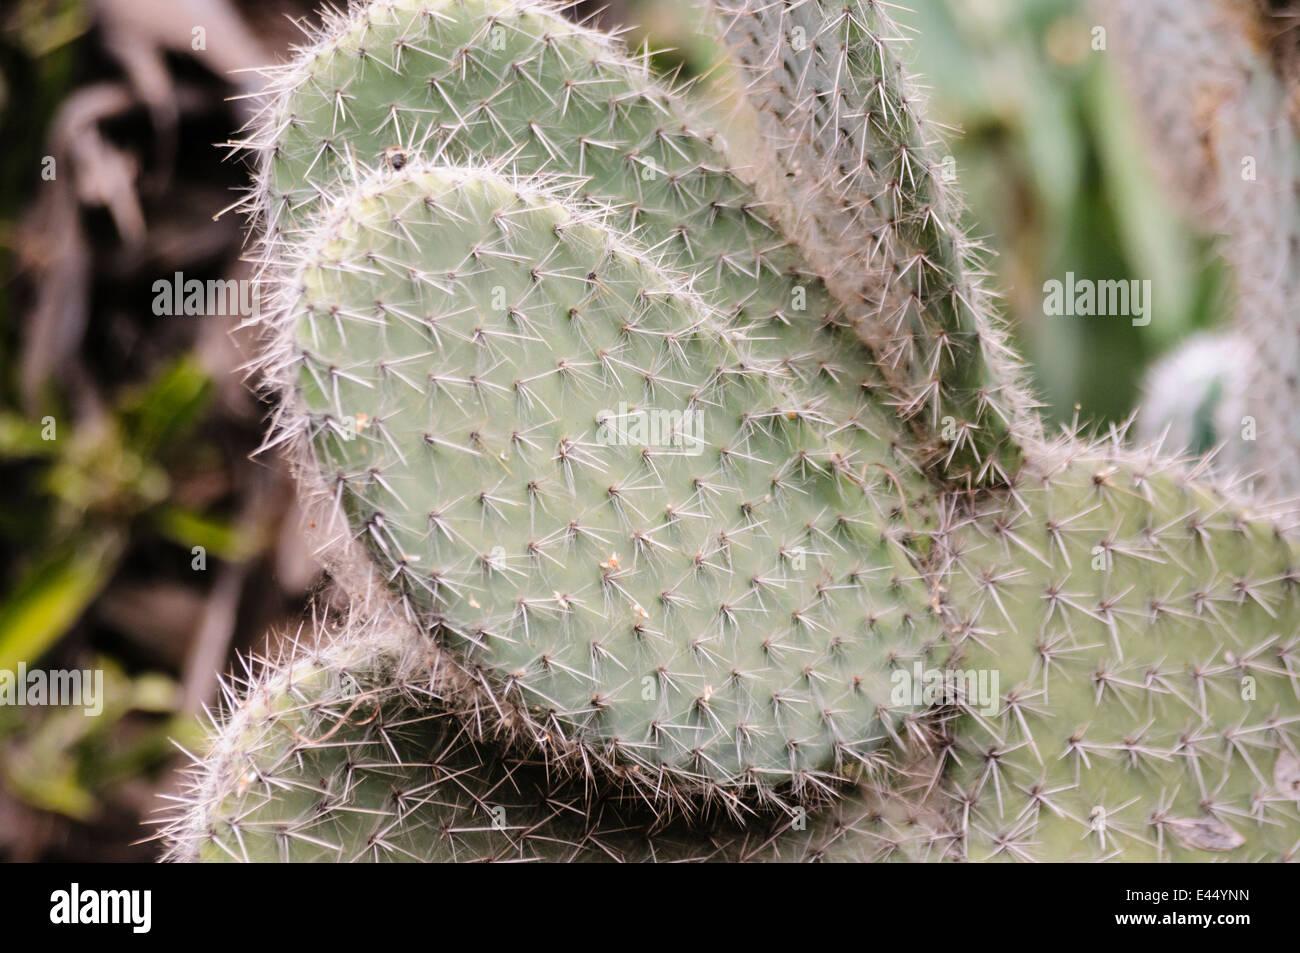 Flache runde Blätter eines Kaktusfeige am Majorelle, Marrakech Stockbild